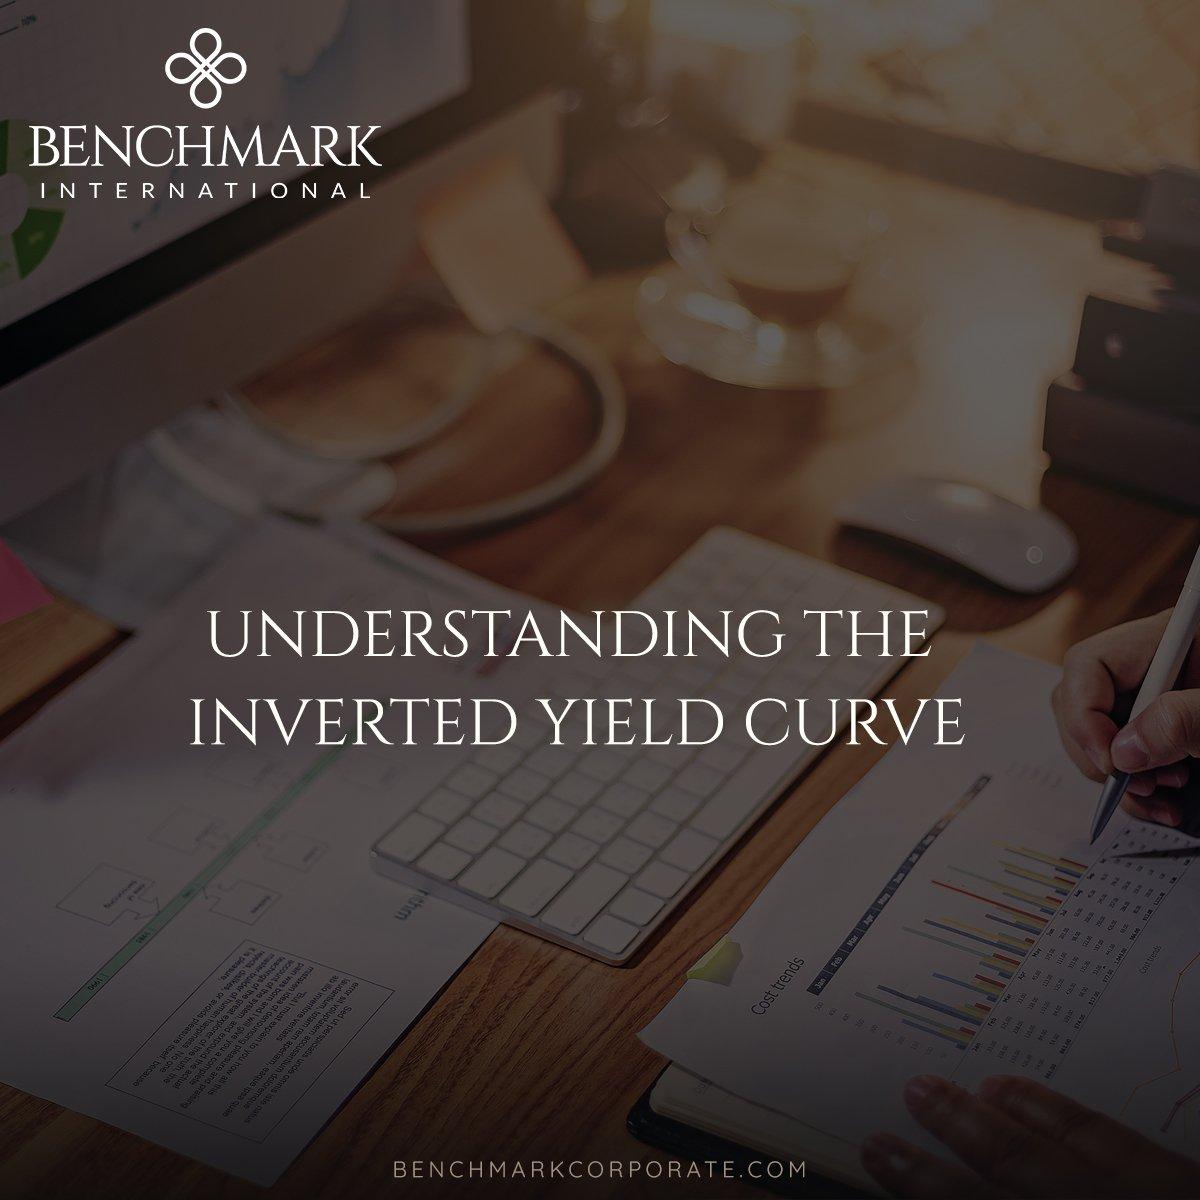 understanding-the-curve-social-1